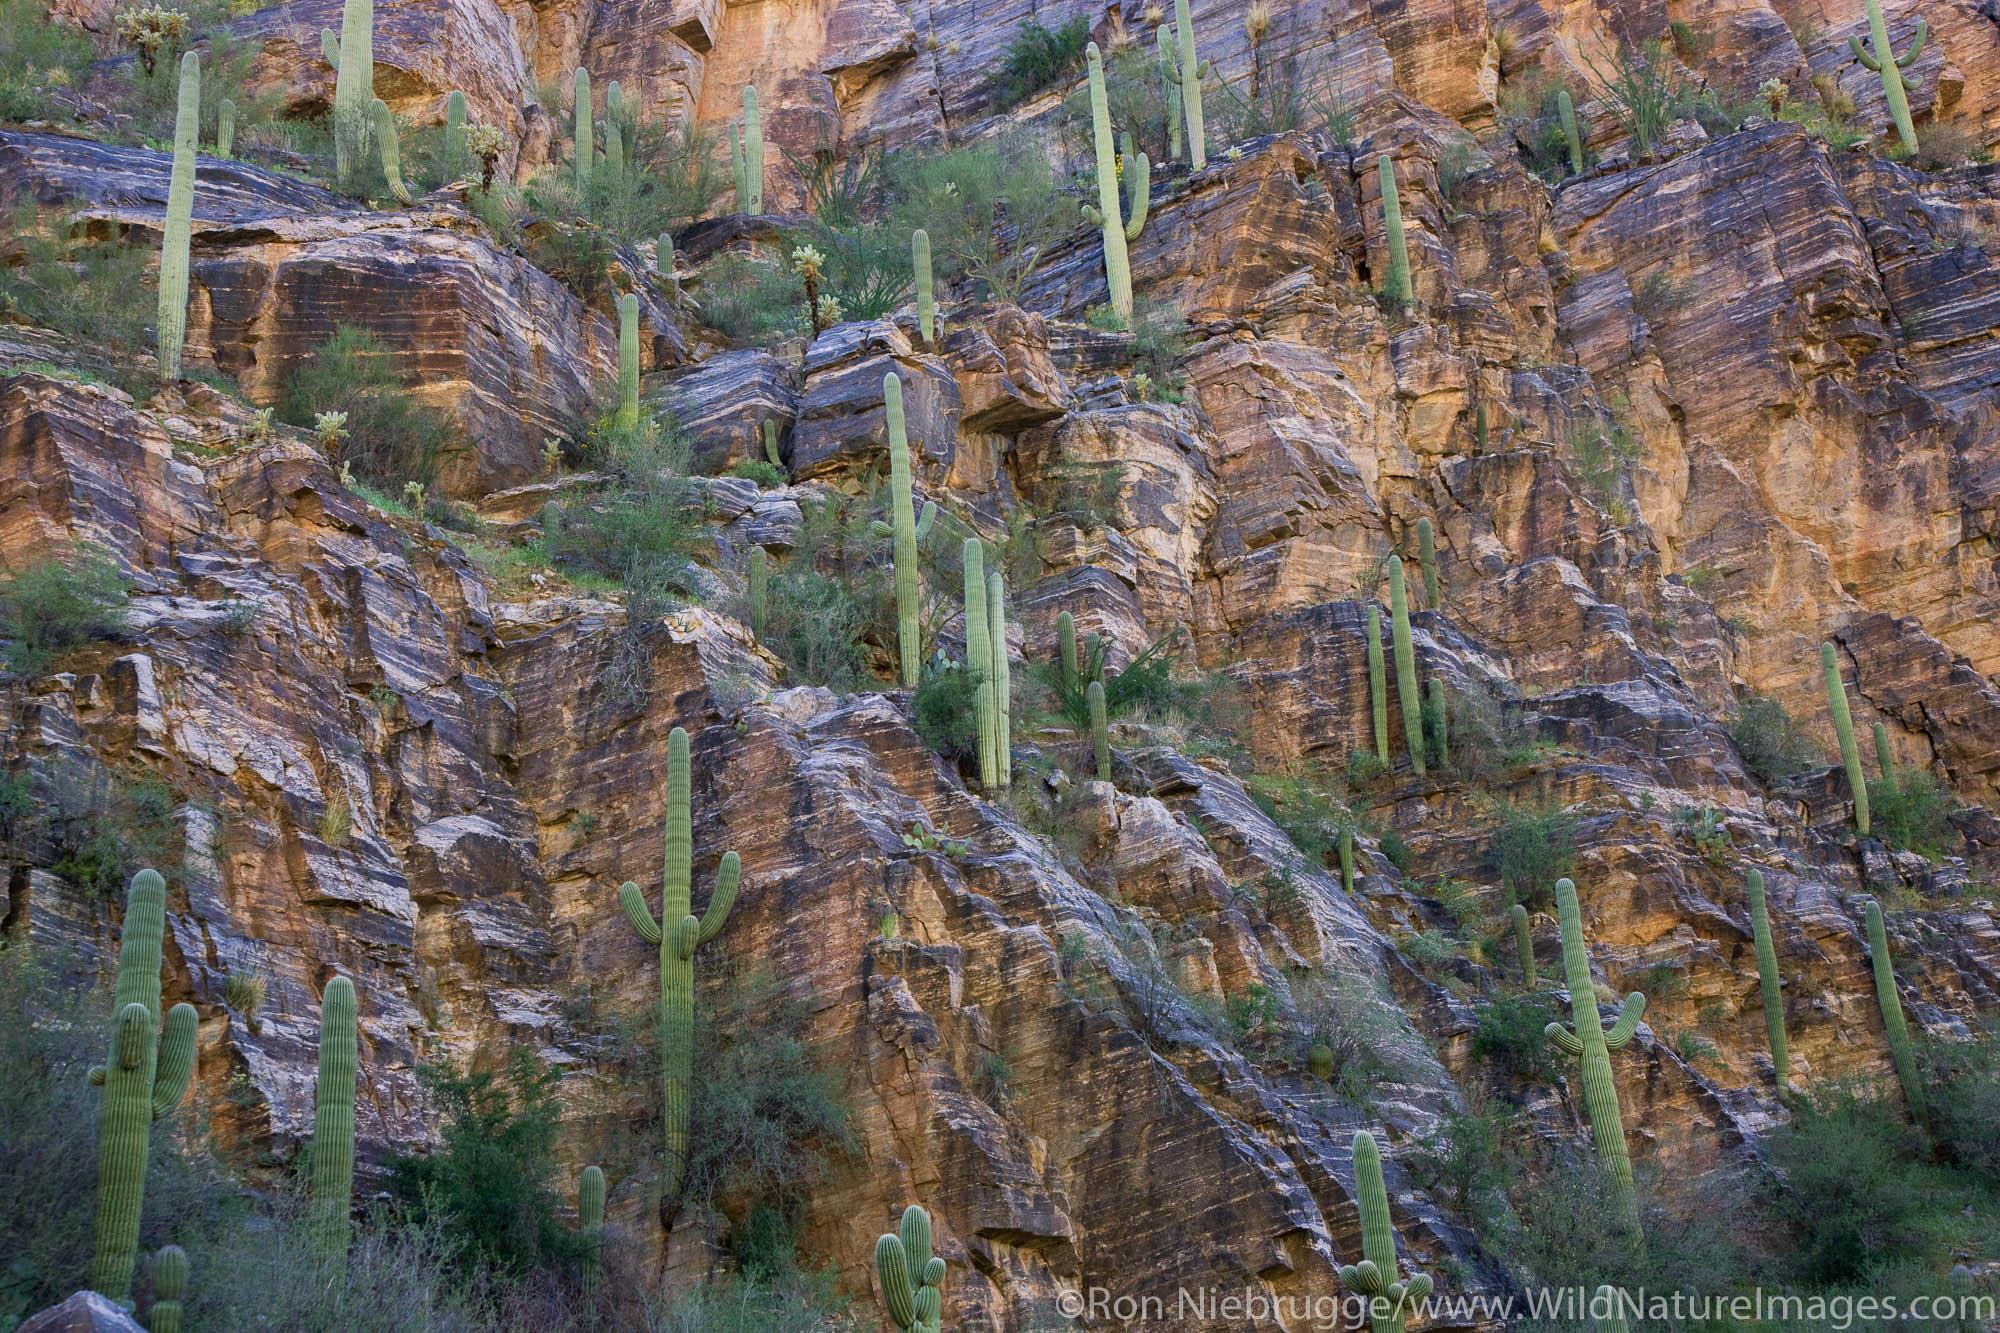 Saguaro Cactus, Sabino Canyon Recreation Area, Tucson, Arizona.